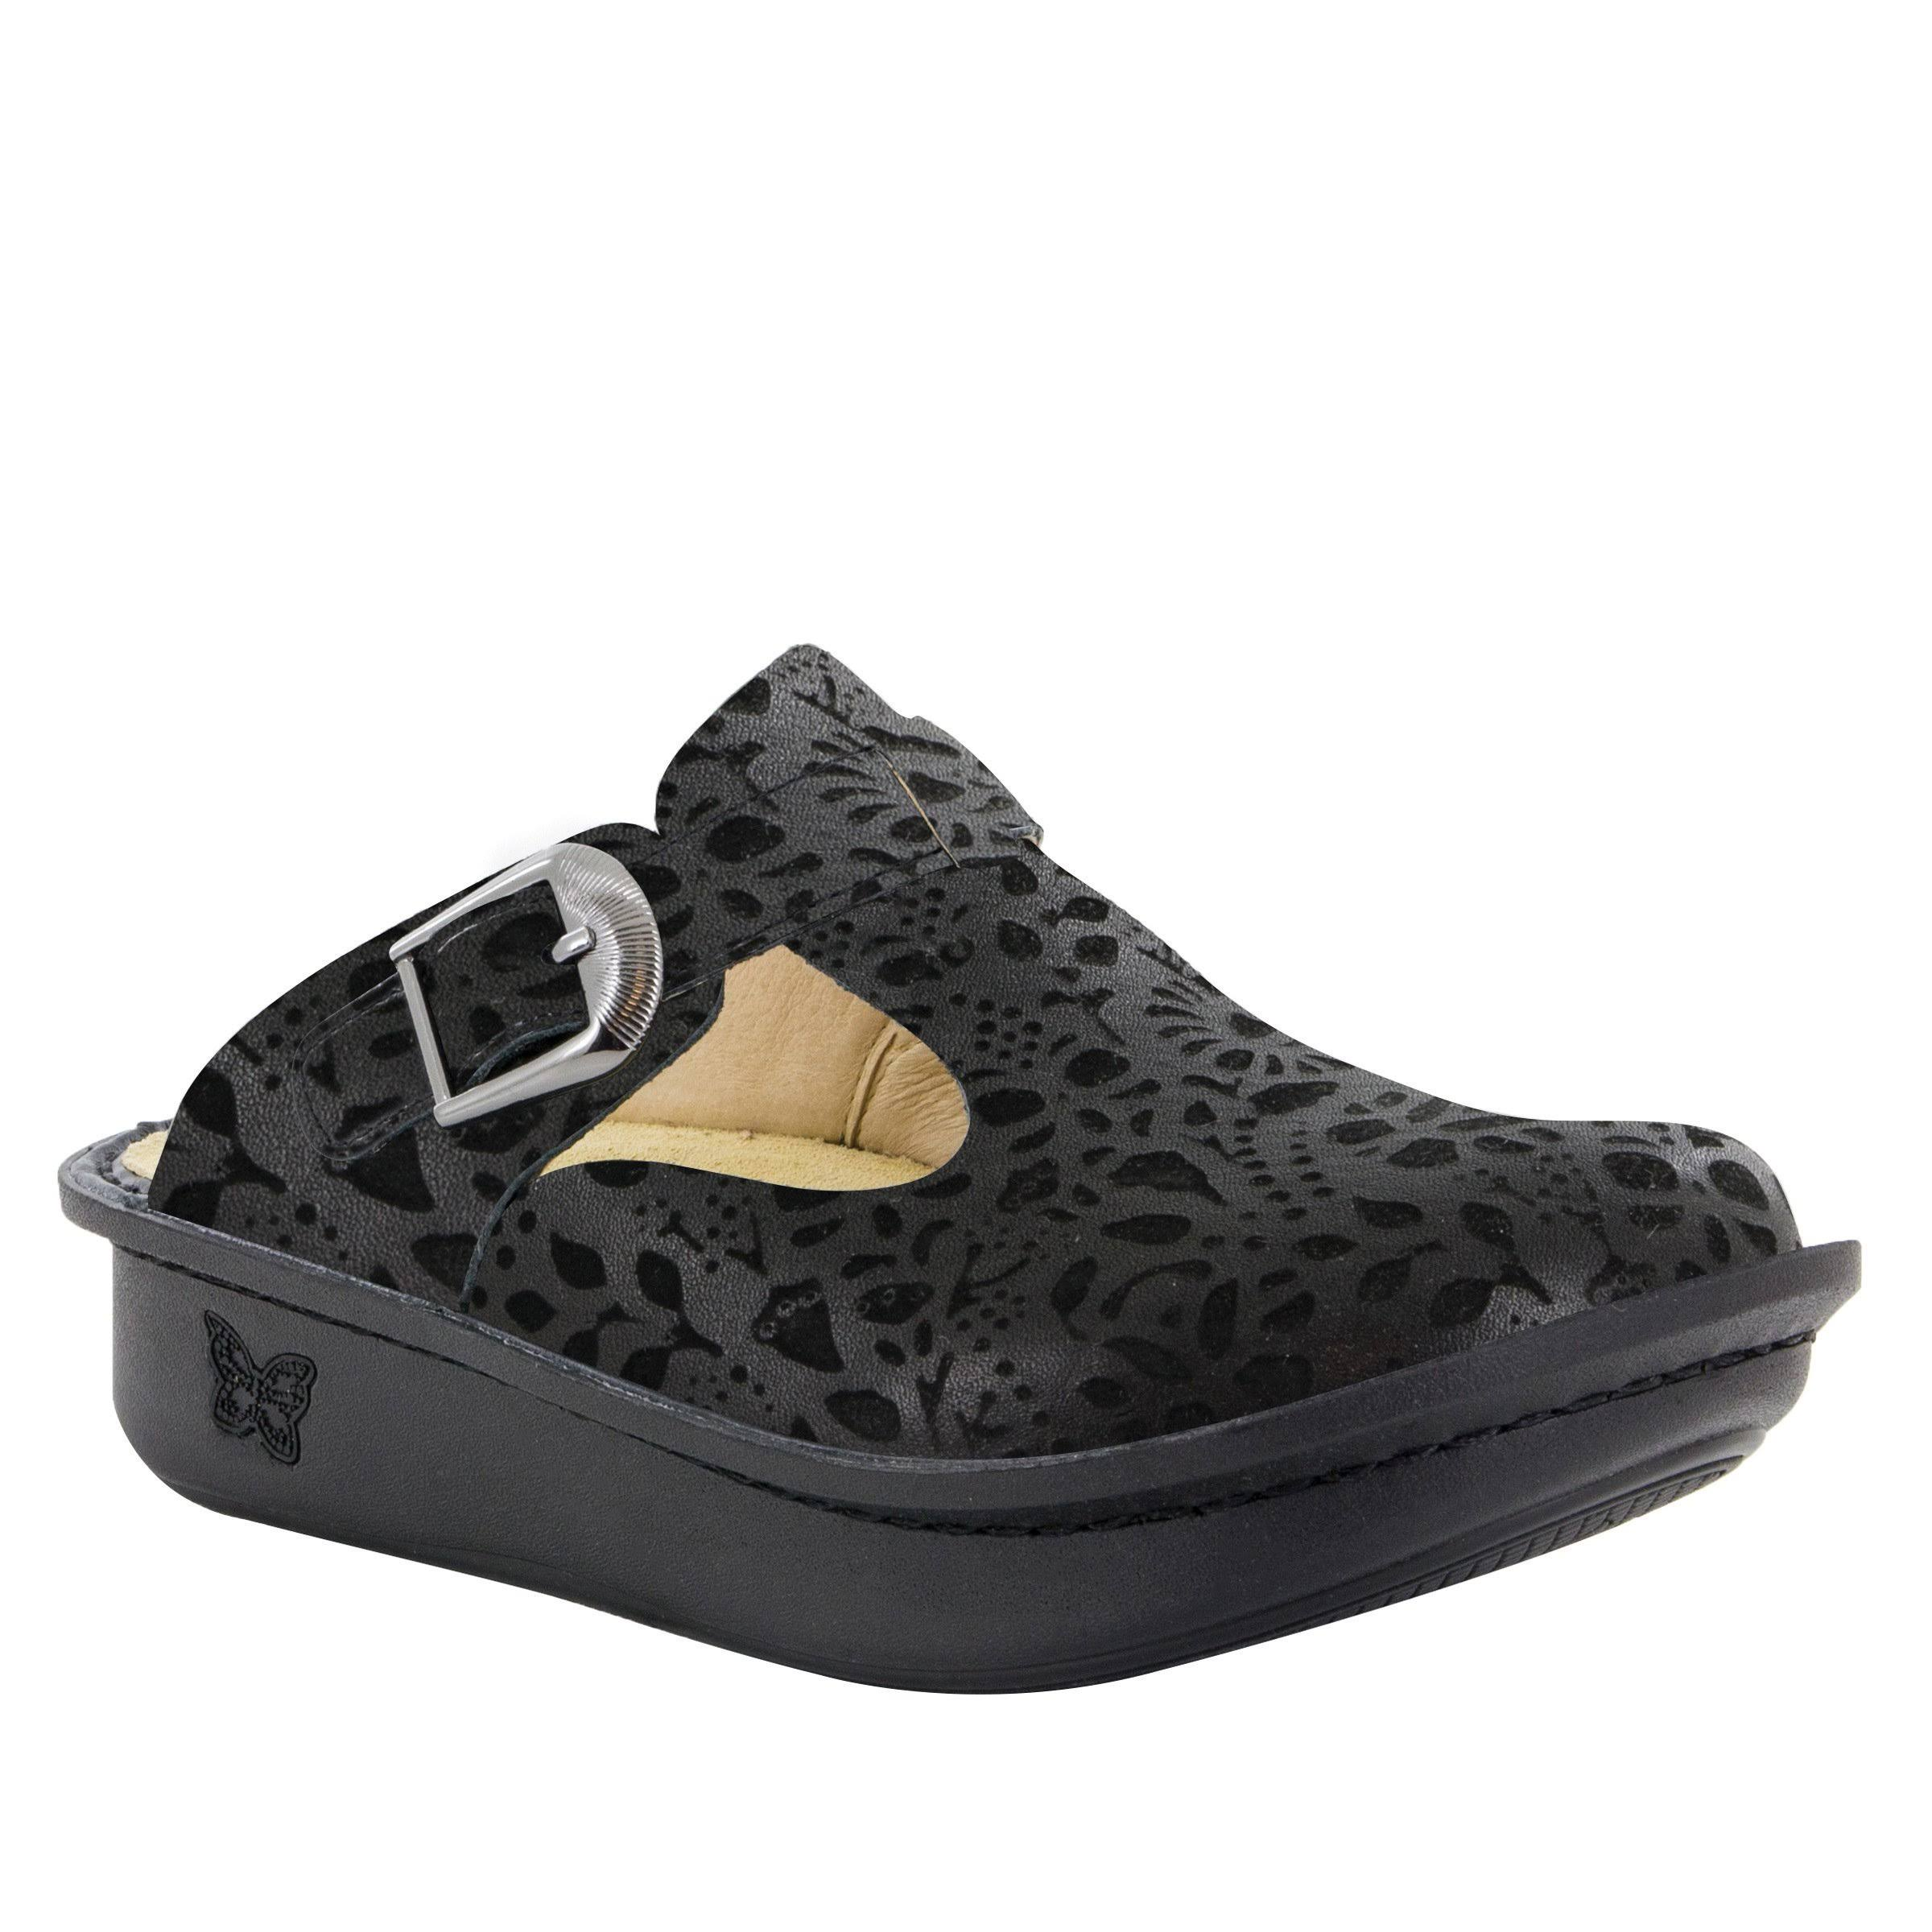 Alegria FemminileDelicut Shoes 38 Alegria Classic 38 Alegria Shoes Classic FemminileDelicut edCxBo